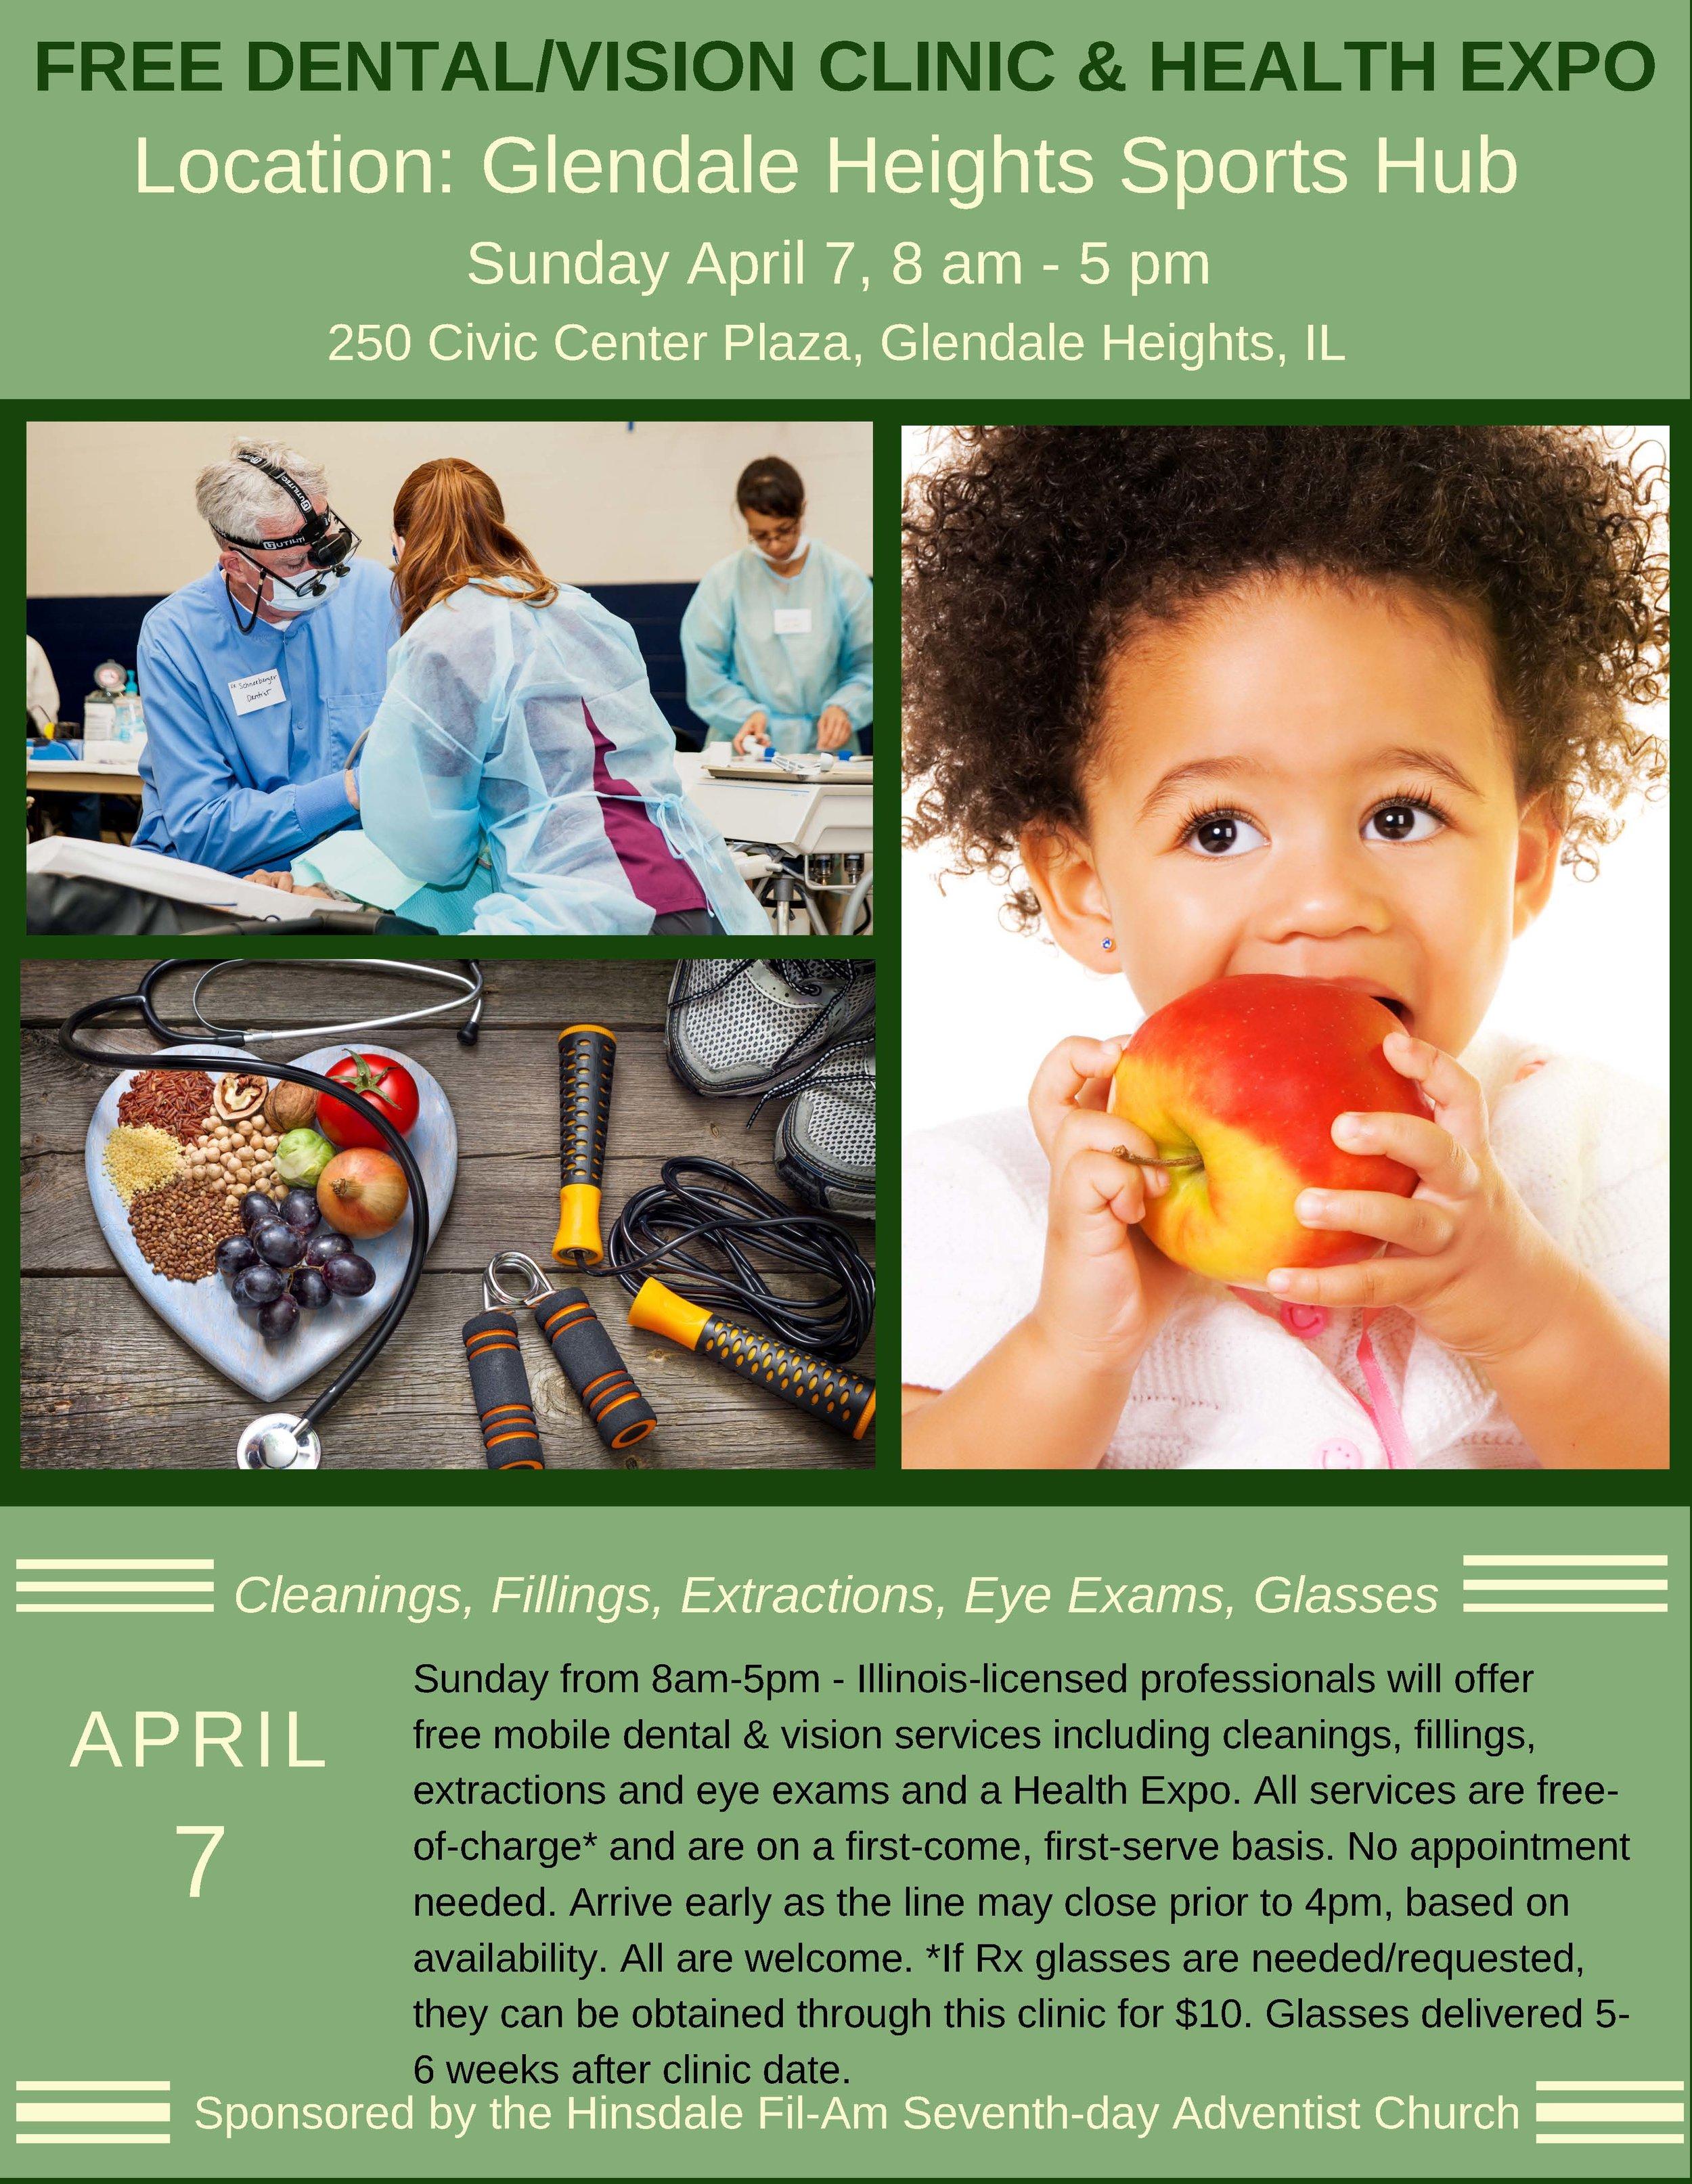 jpgGlendale Heights Dental and Vision Clinic Flyer.jpg